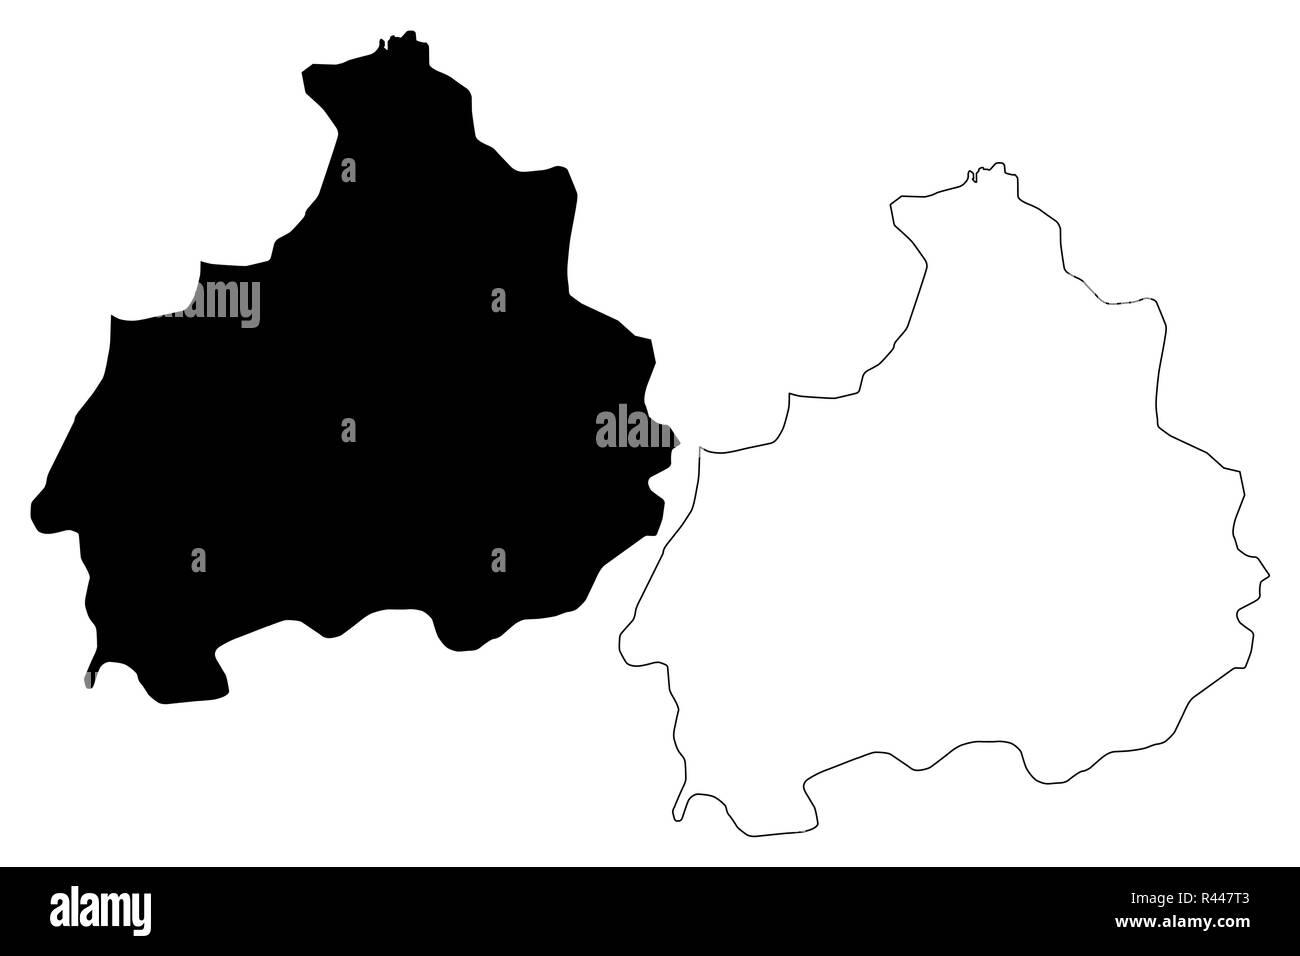 Aksaray (Provinces of the Republic of Turkey) map vector illustration, scribble sketch Aksaray ili map - Stock Image